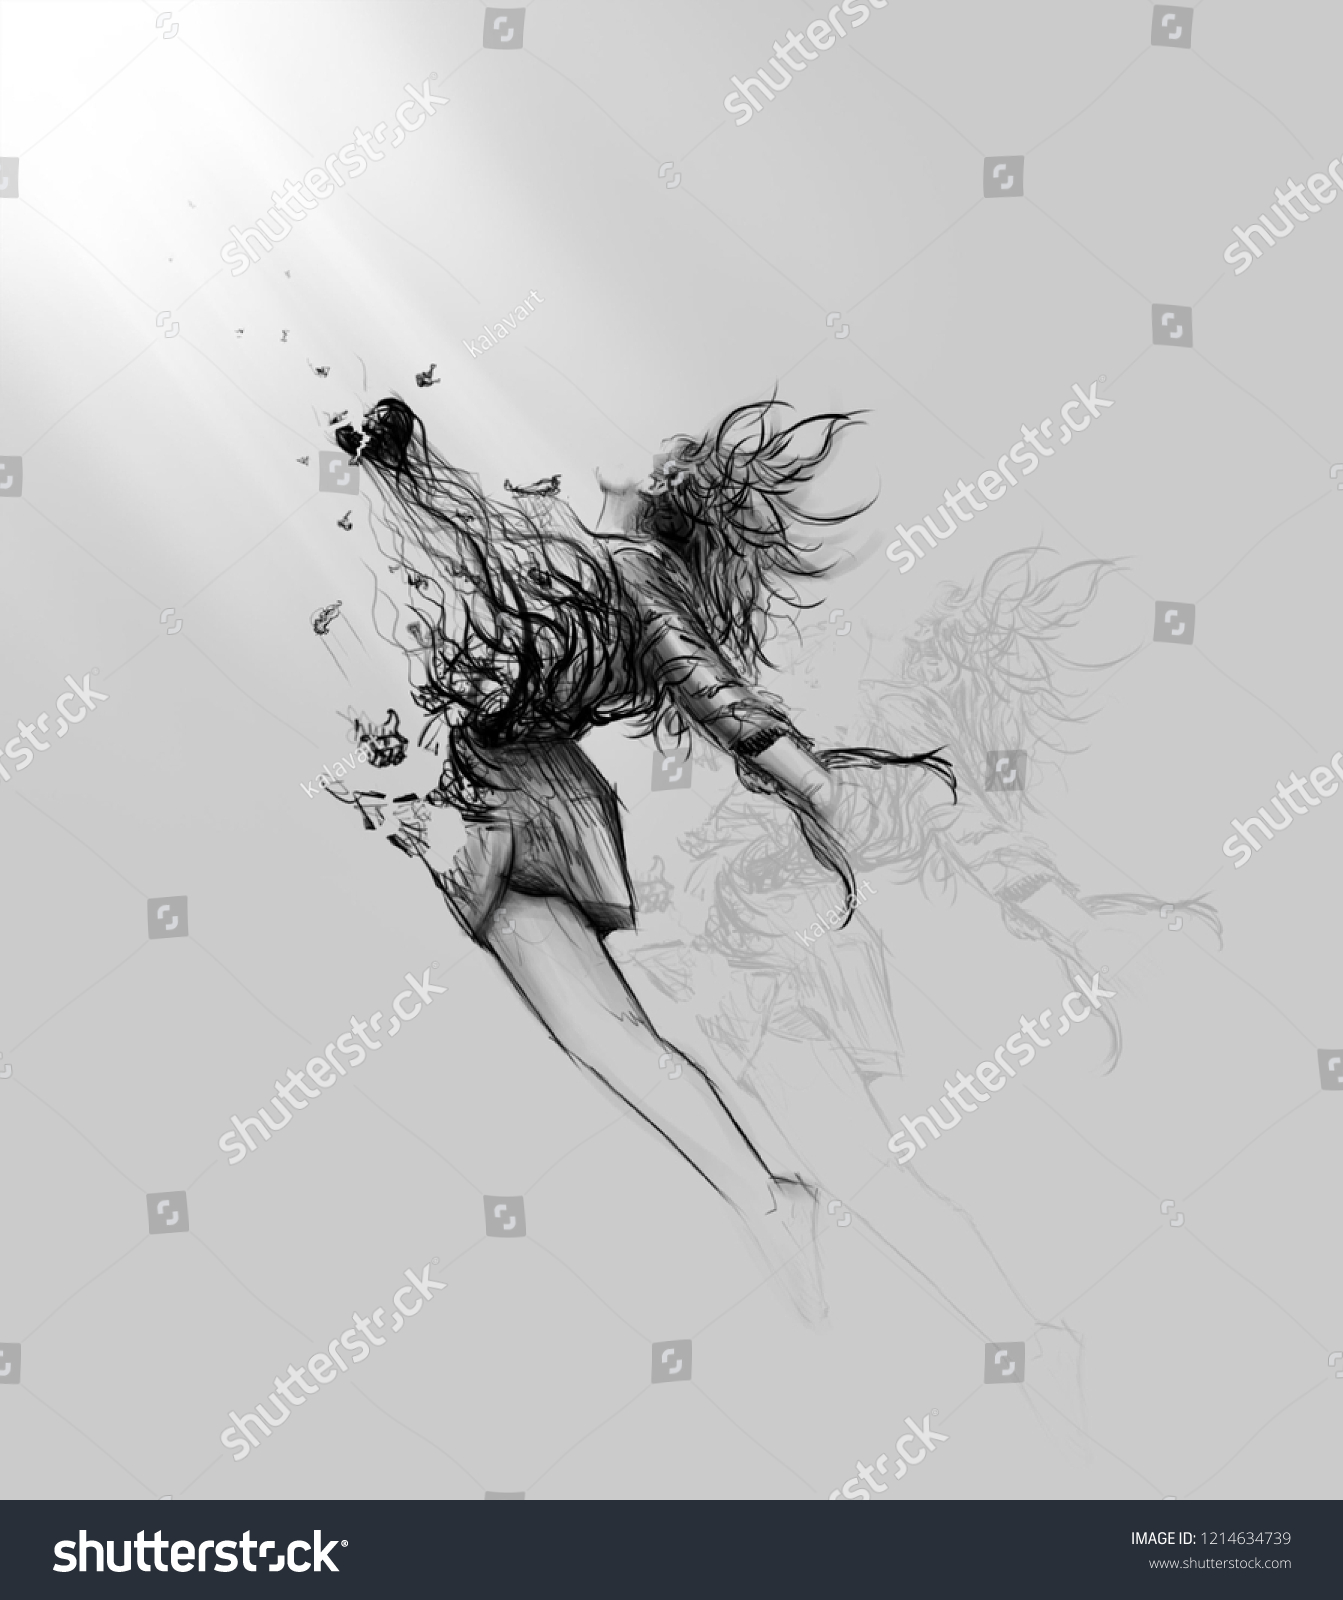 Broken Heart Drawing Woman Illustration On Royalty Free Stock Image